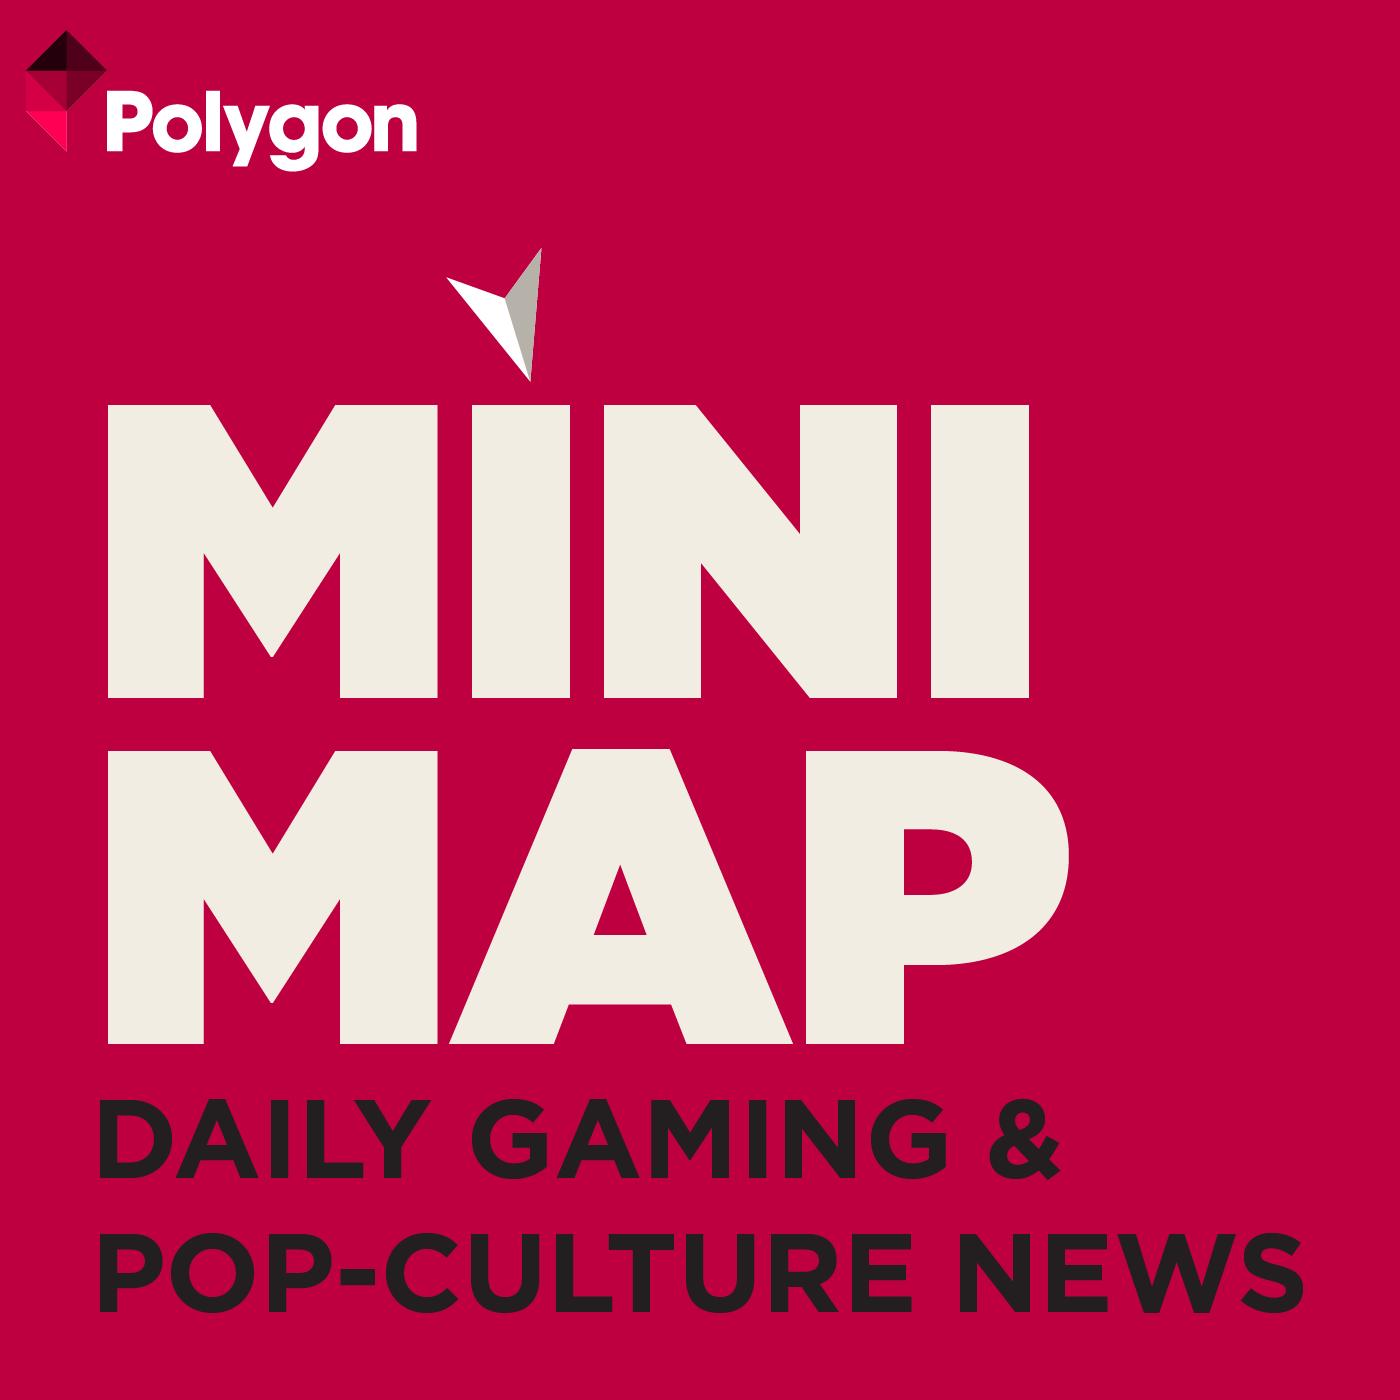 Polygon Minimap